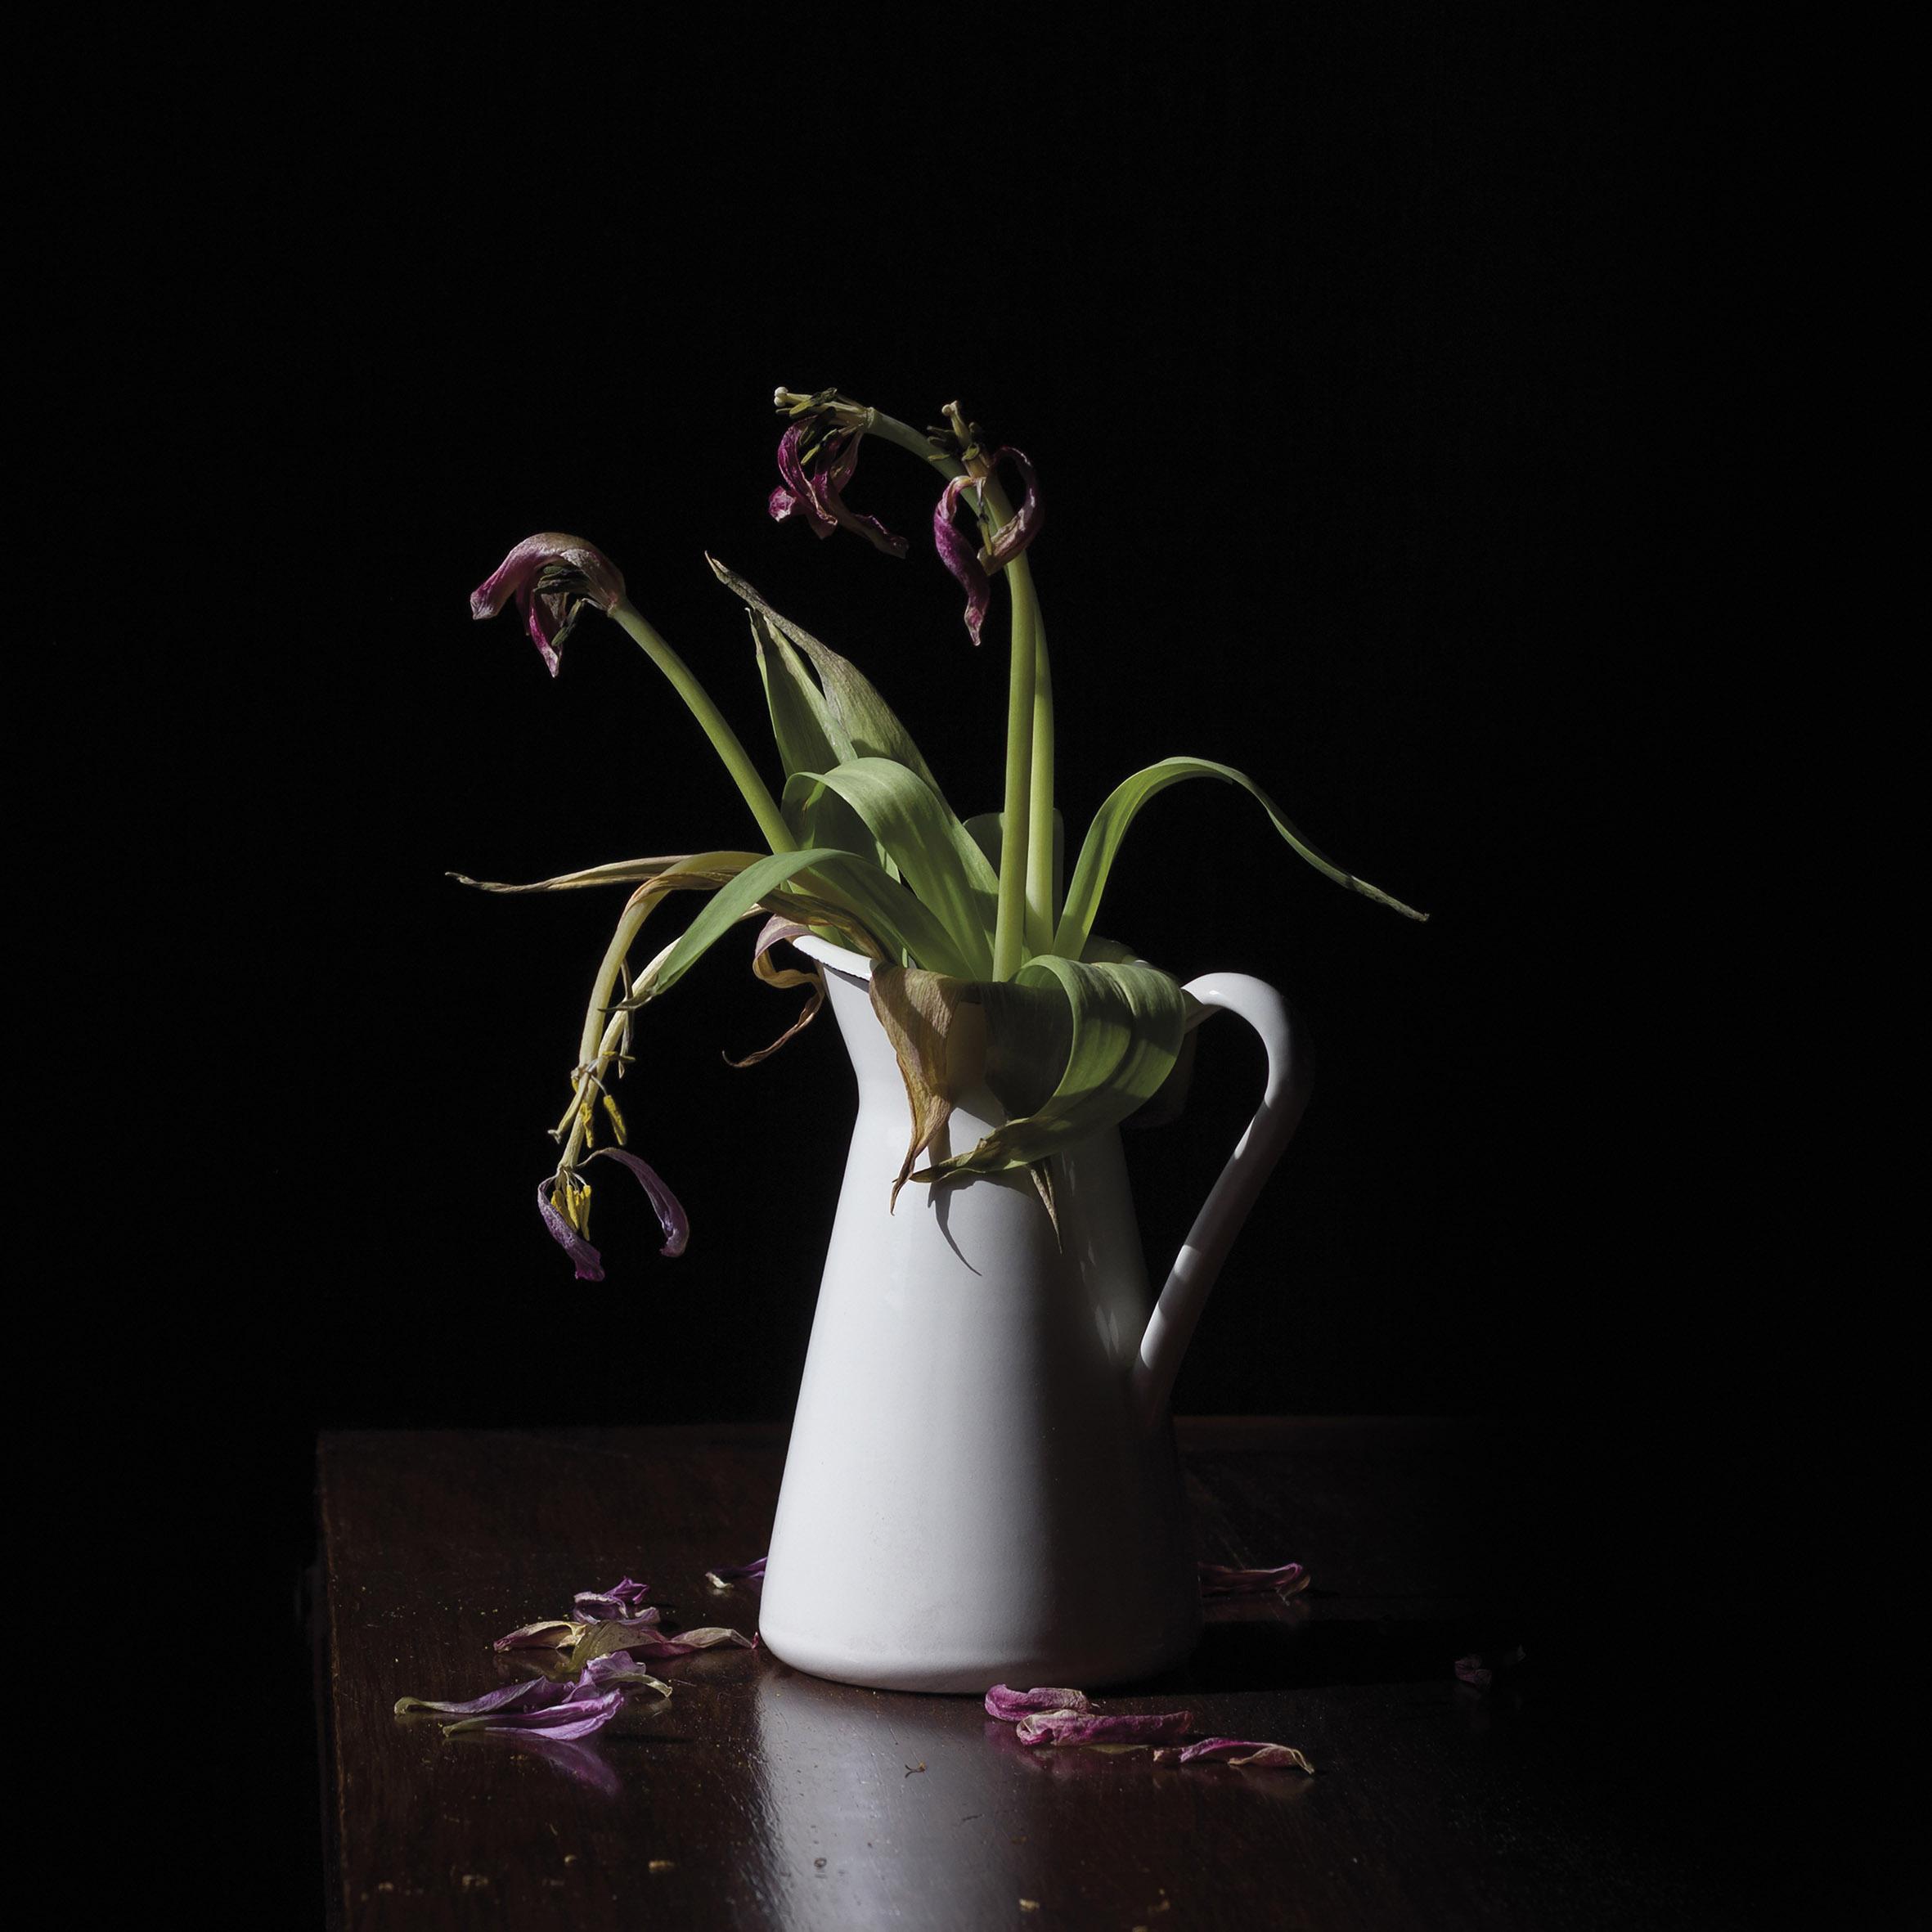 Categorie: Still Life & Food - Photographer: MILA MICHELASSI; Location: Firenze, FI, Italia